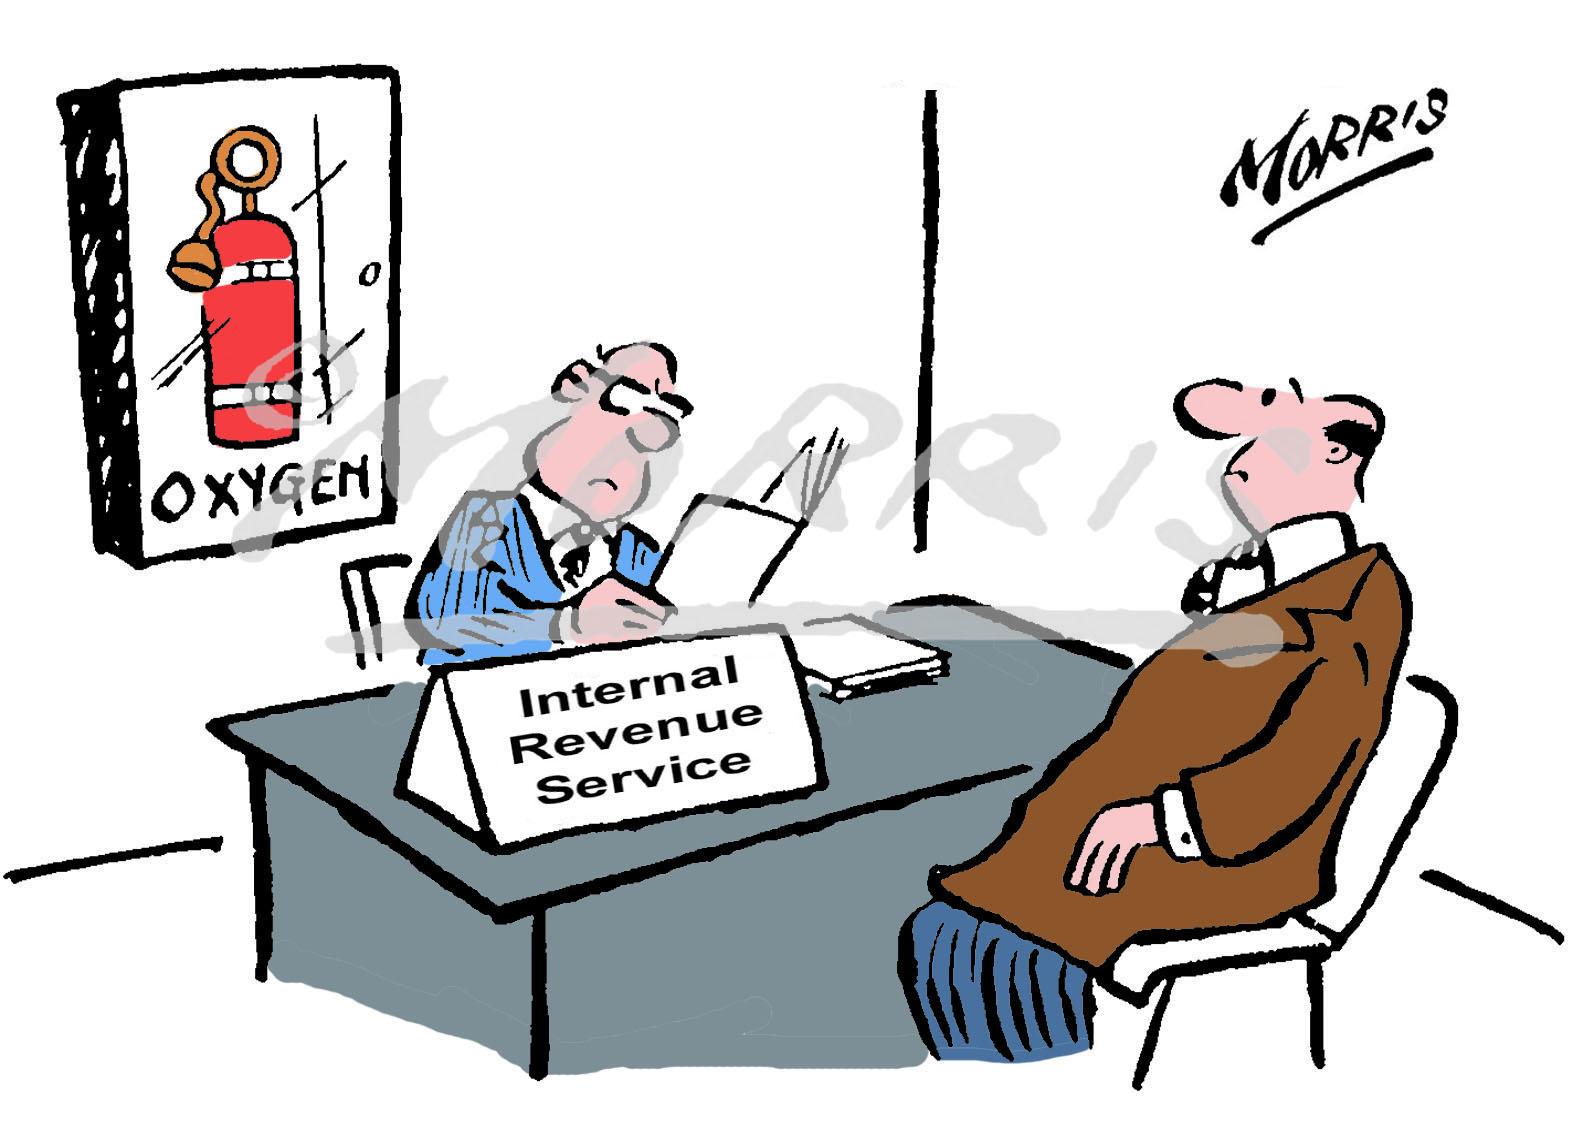 Internal Revenue Service comic cartoon Ref: 0015colus